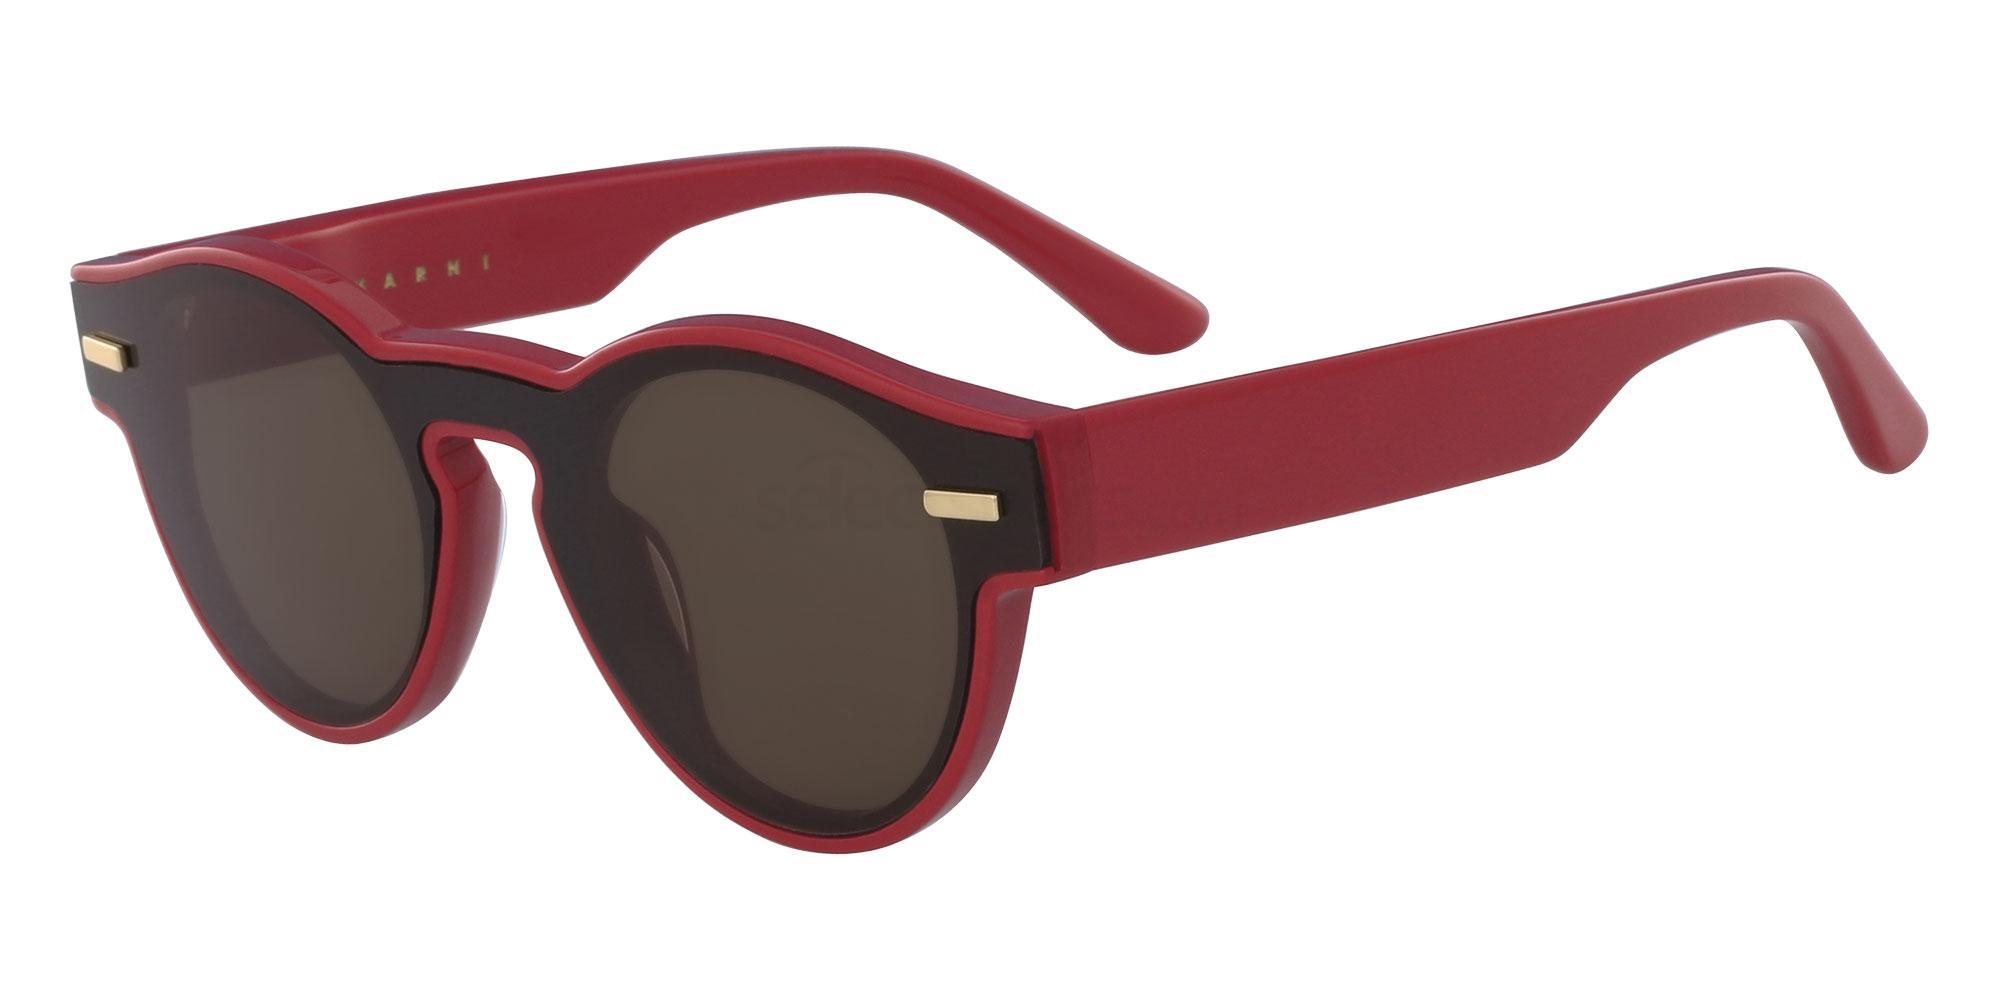 613 ME620S Sunglasses, Marni